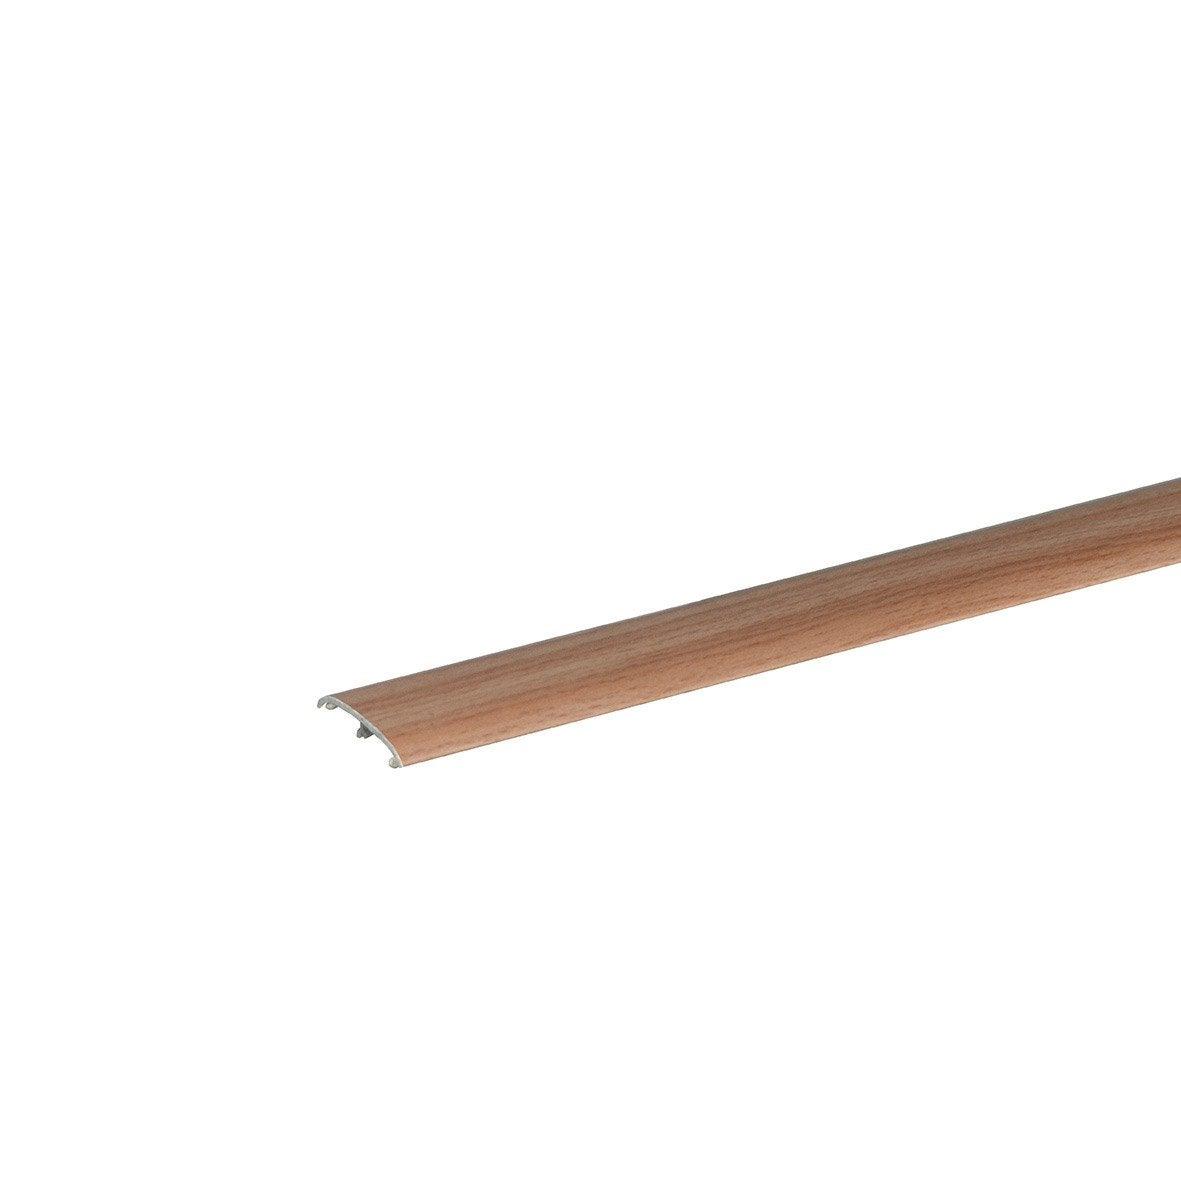 barre de seuil effet h tre 3 frises pour sol stratifi cm x mm leroy merlin. Black Bedroom Furniture Sets. Home Design Ideas